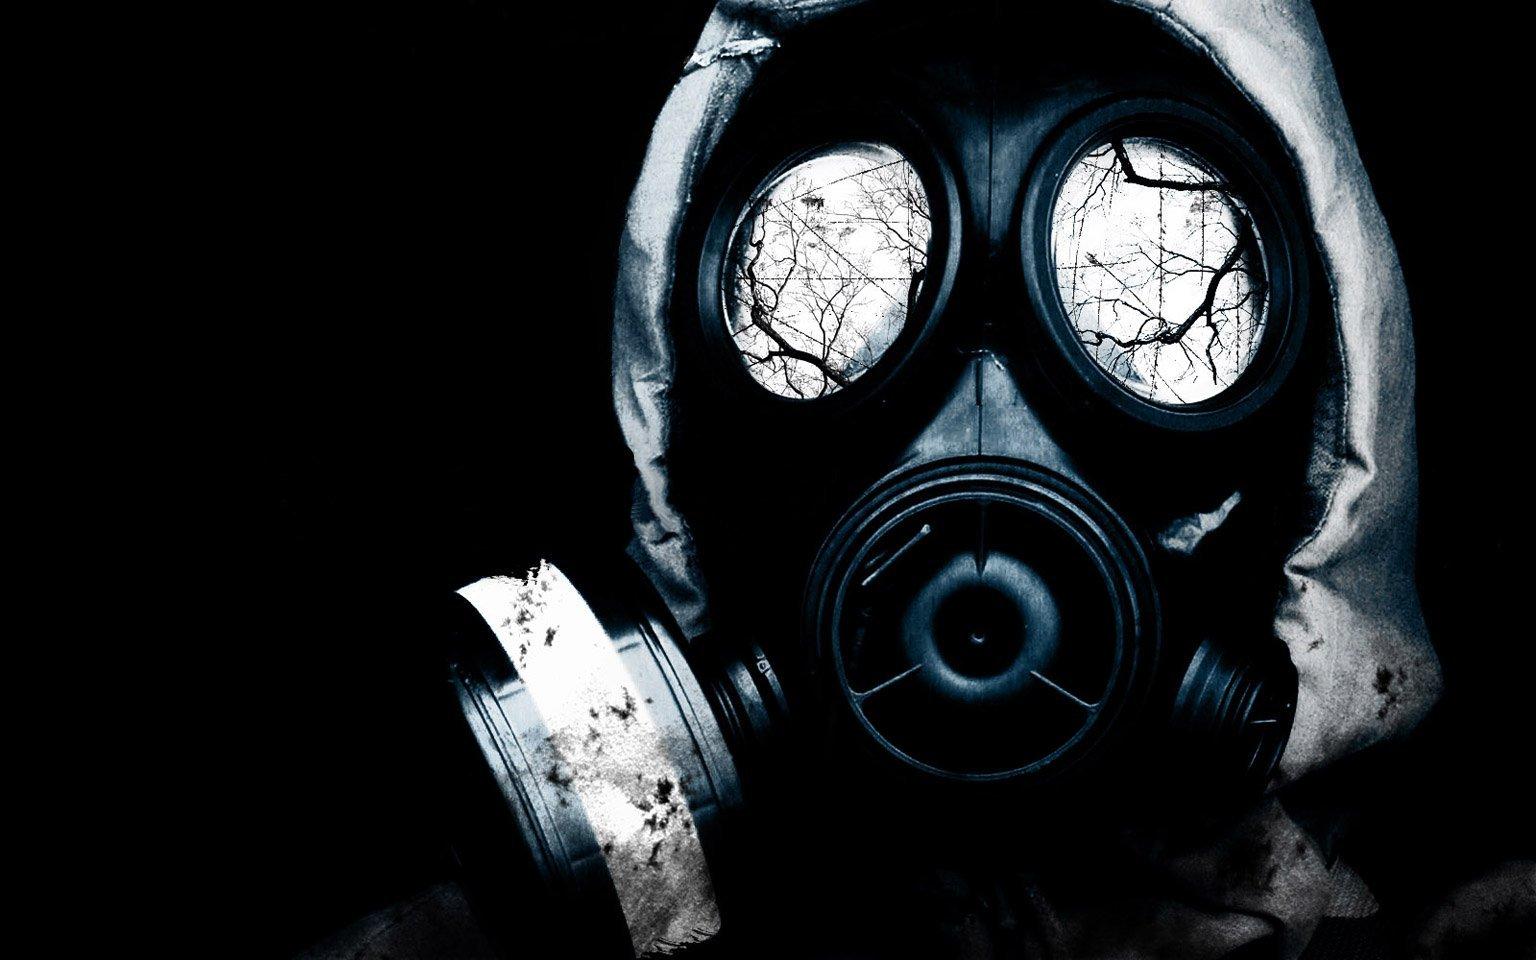 http://1.bp.blogspot.com/_6F1goSN3h9s/TJq2y9WB_RI/AAAAAAAAAYE/EEngxKrBmI4/s1600/violence,+rebellion+and+roits+%2810%29.jpg